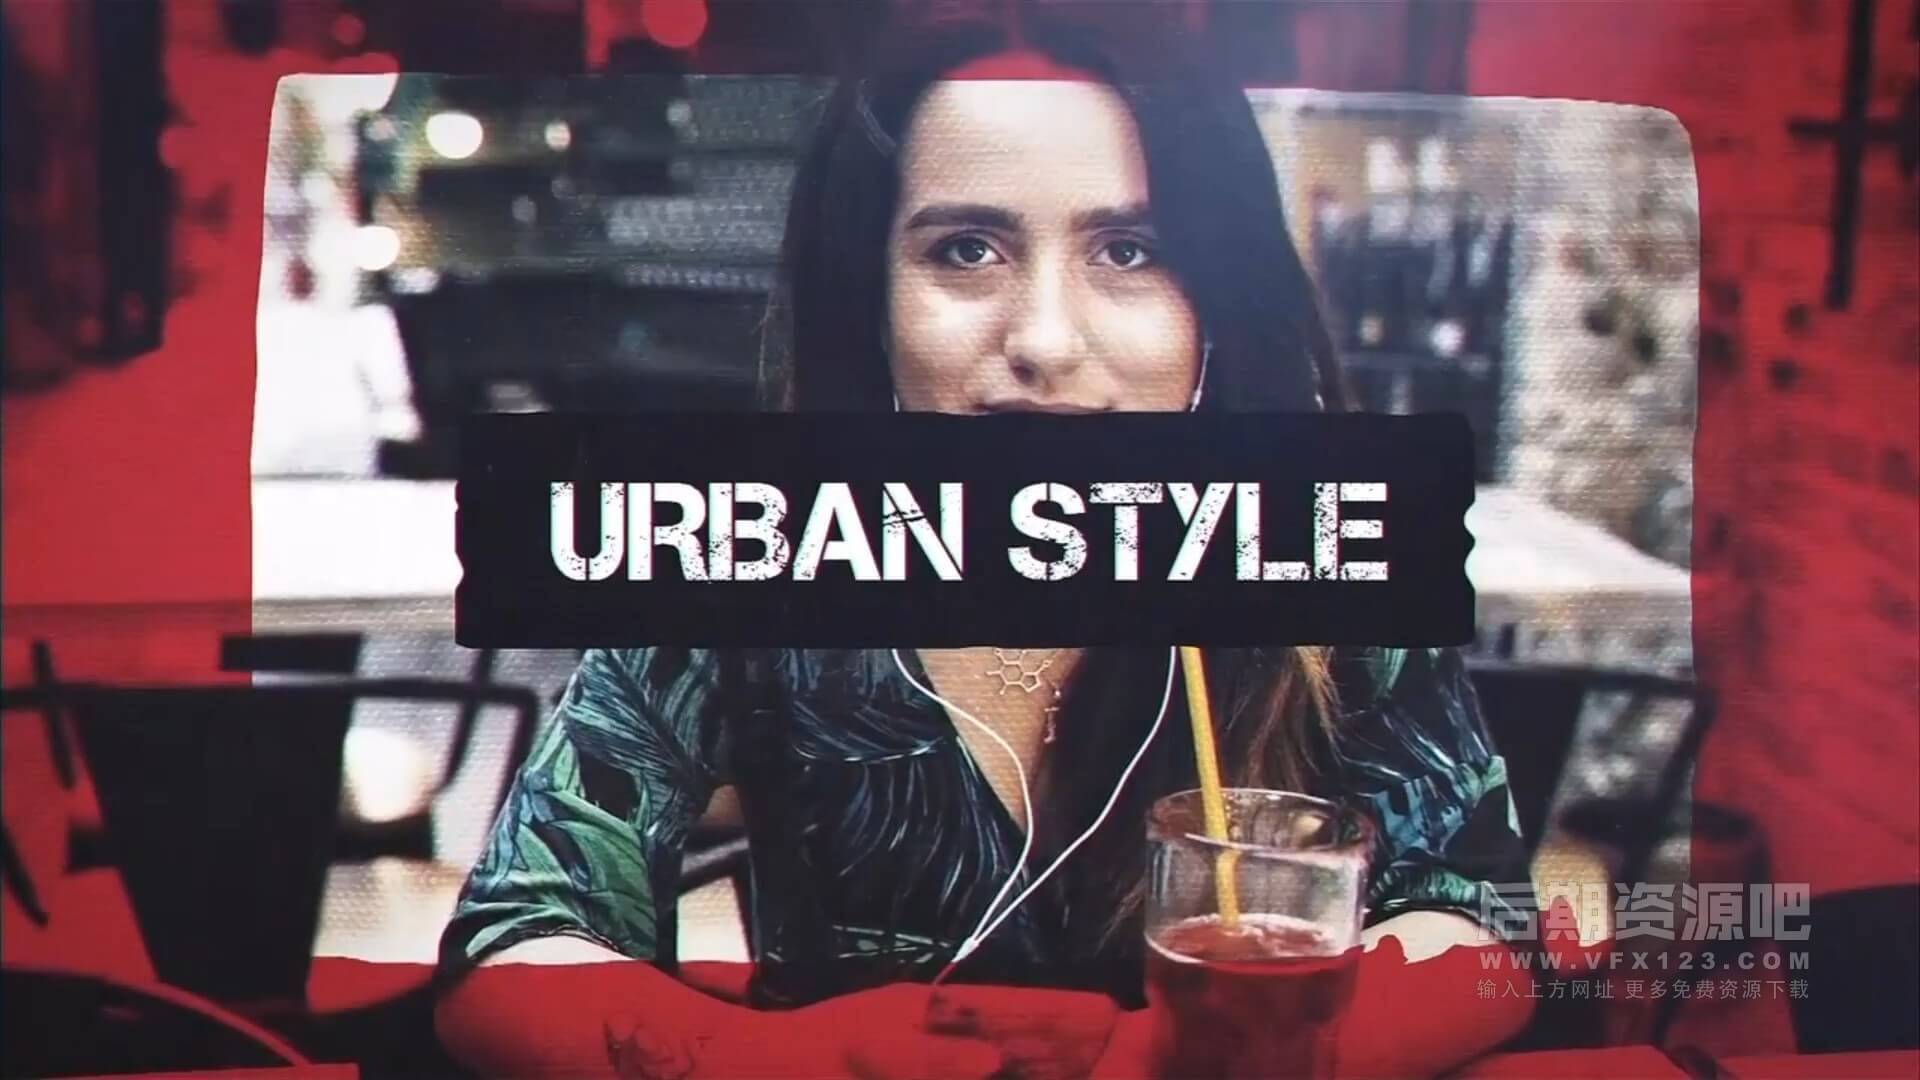 fcpx主题模板 现代潮流都市风格图文视频展示片头 Urban Style